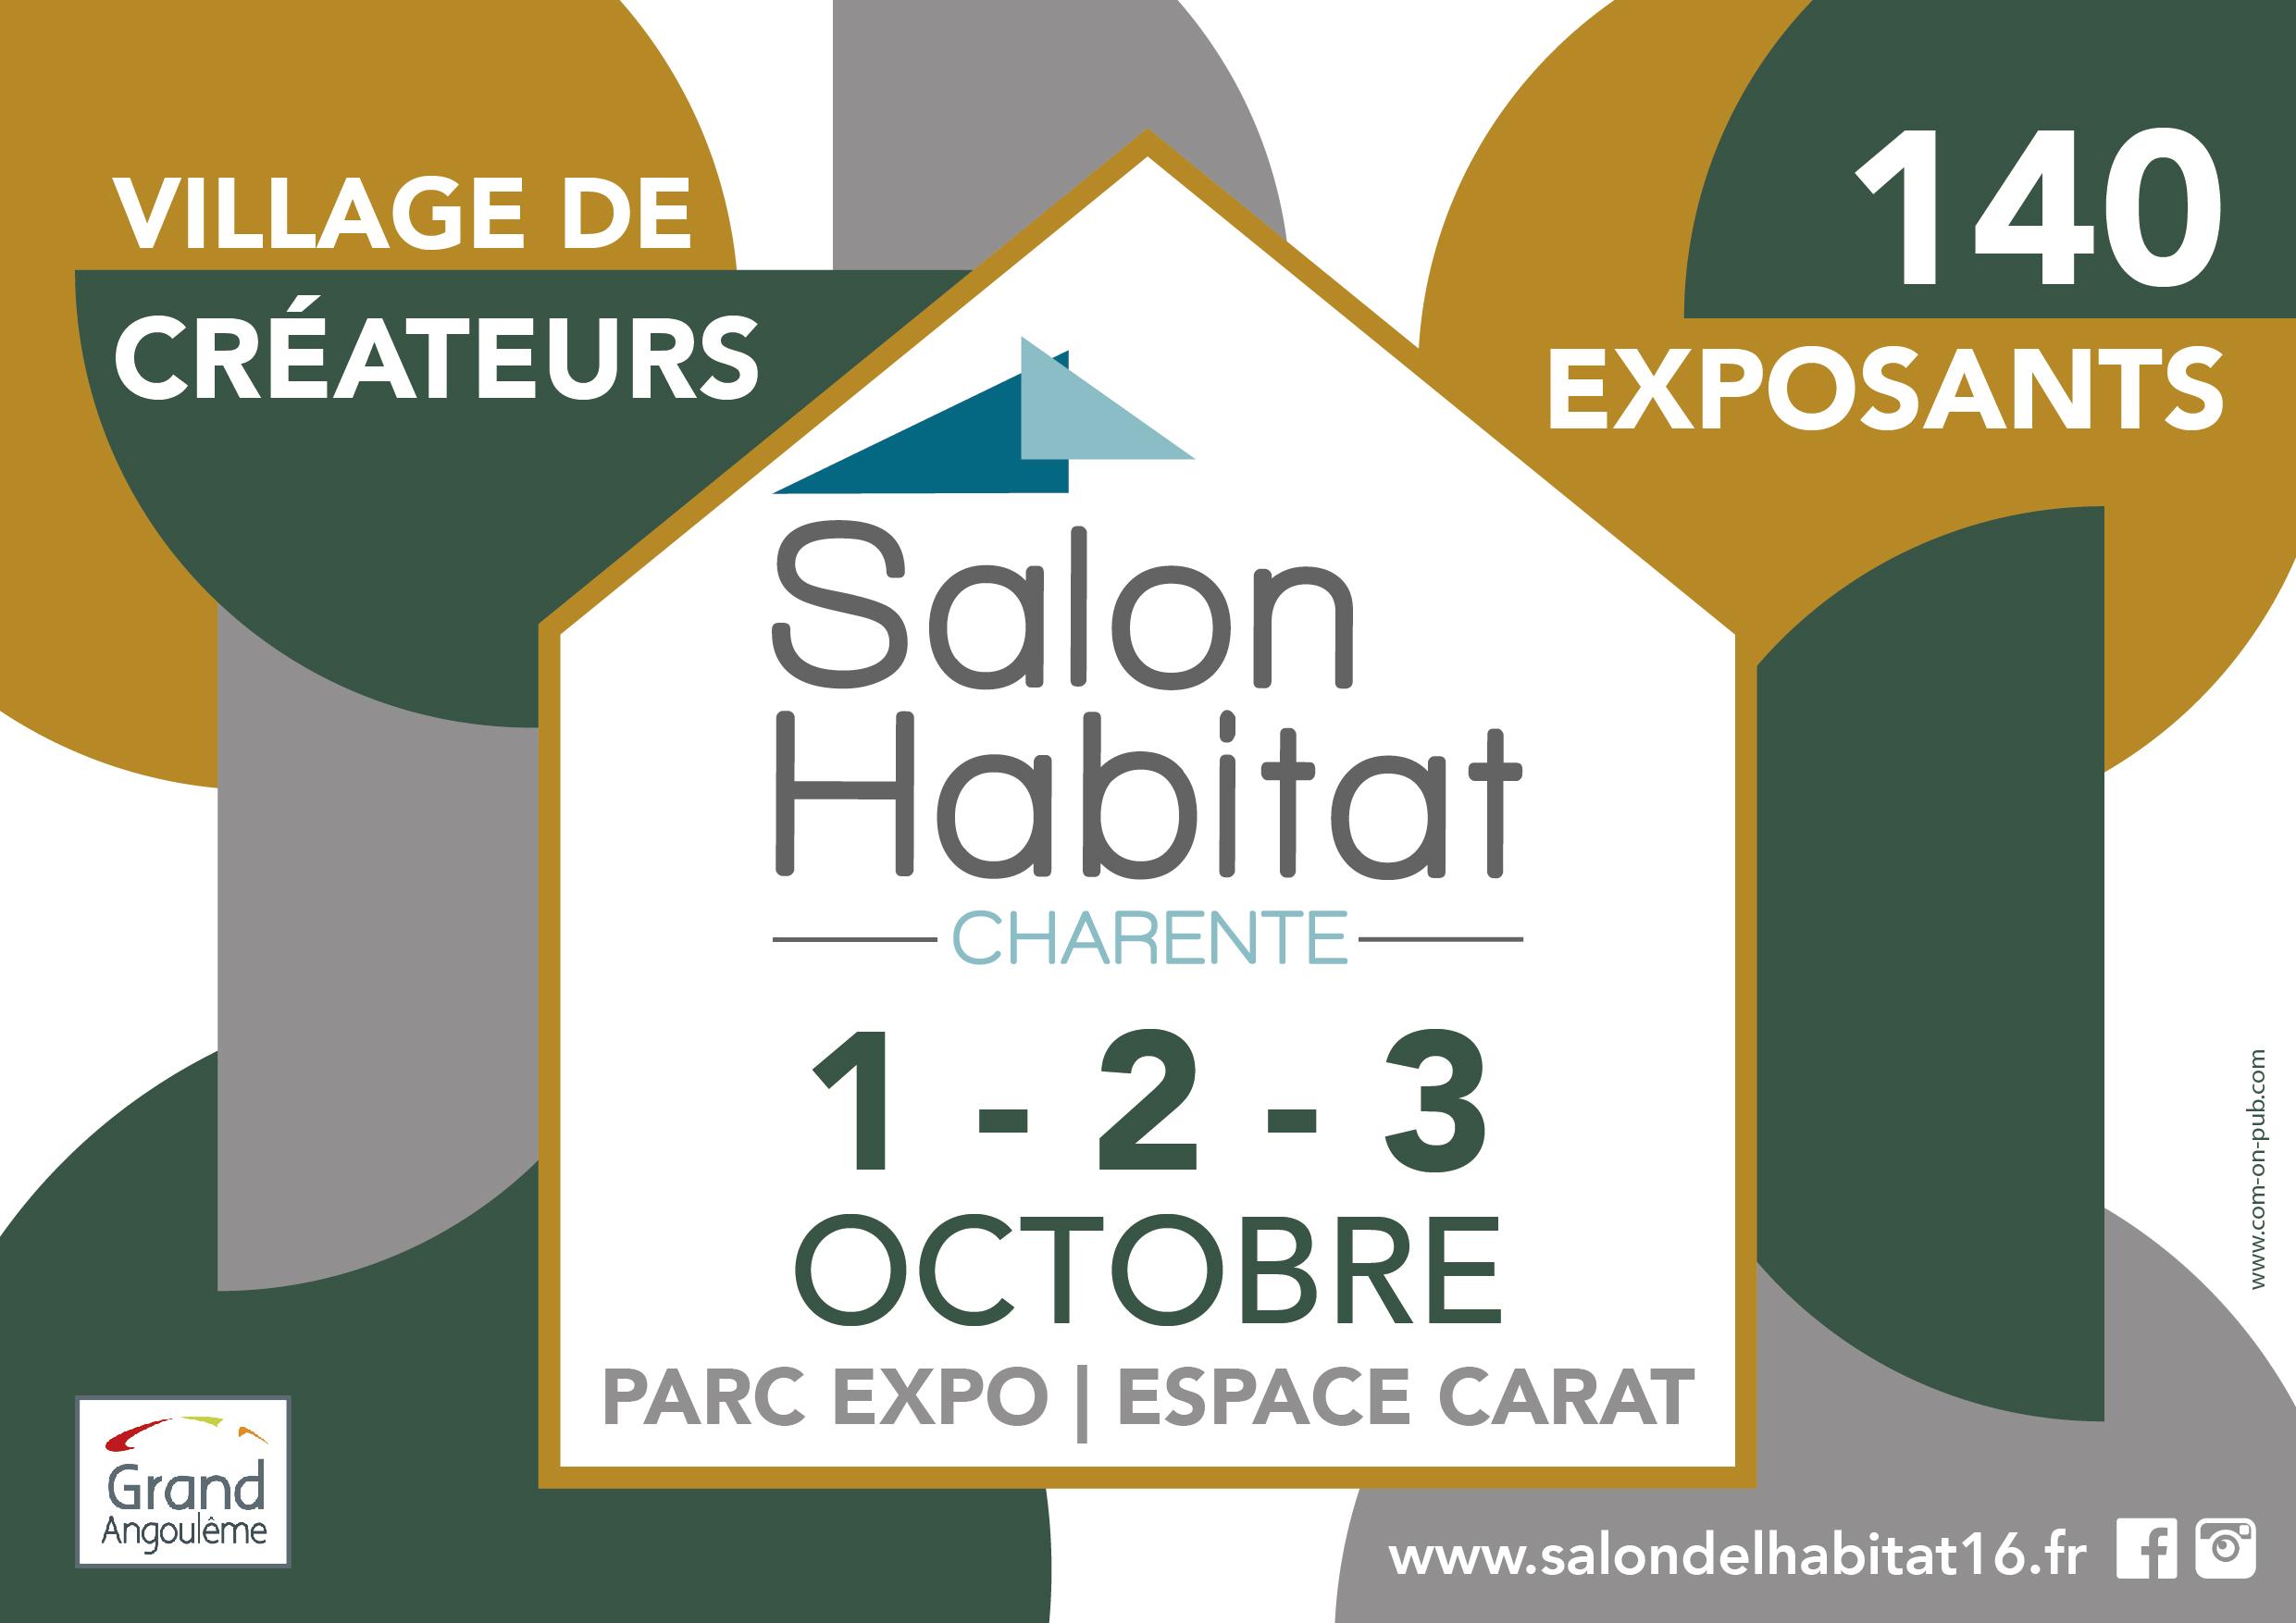 Salon de l'habitat 2021